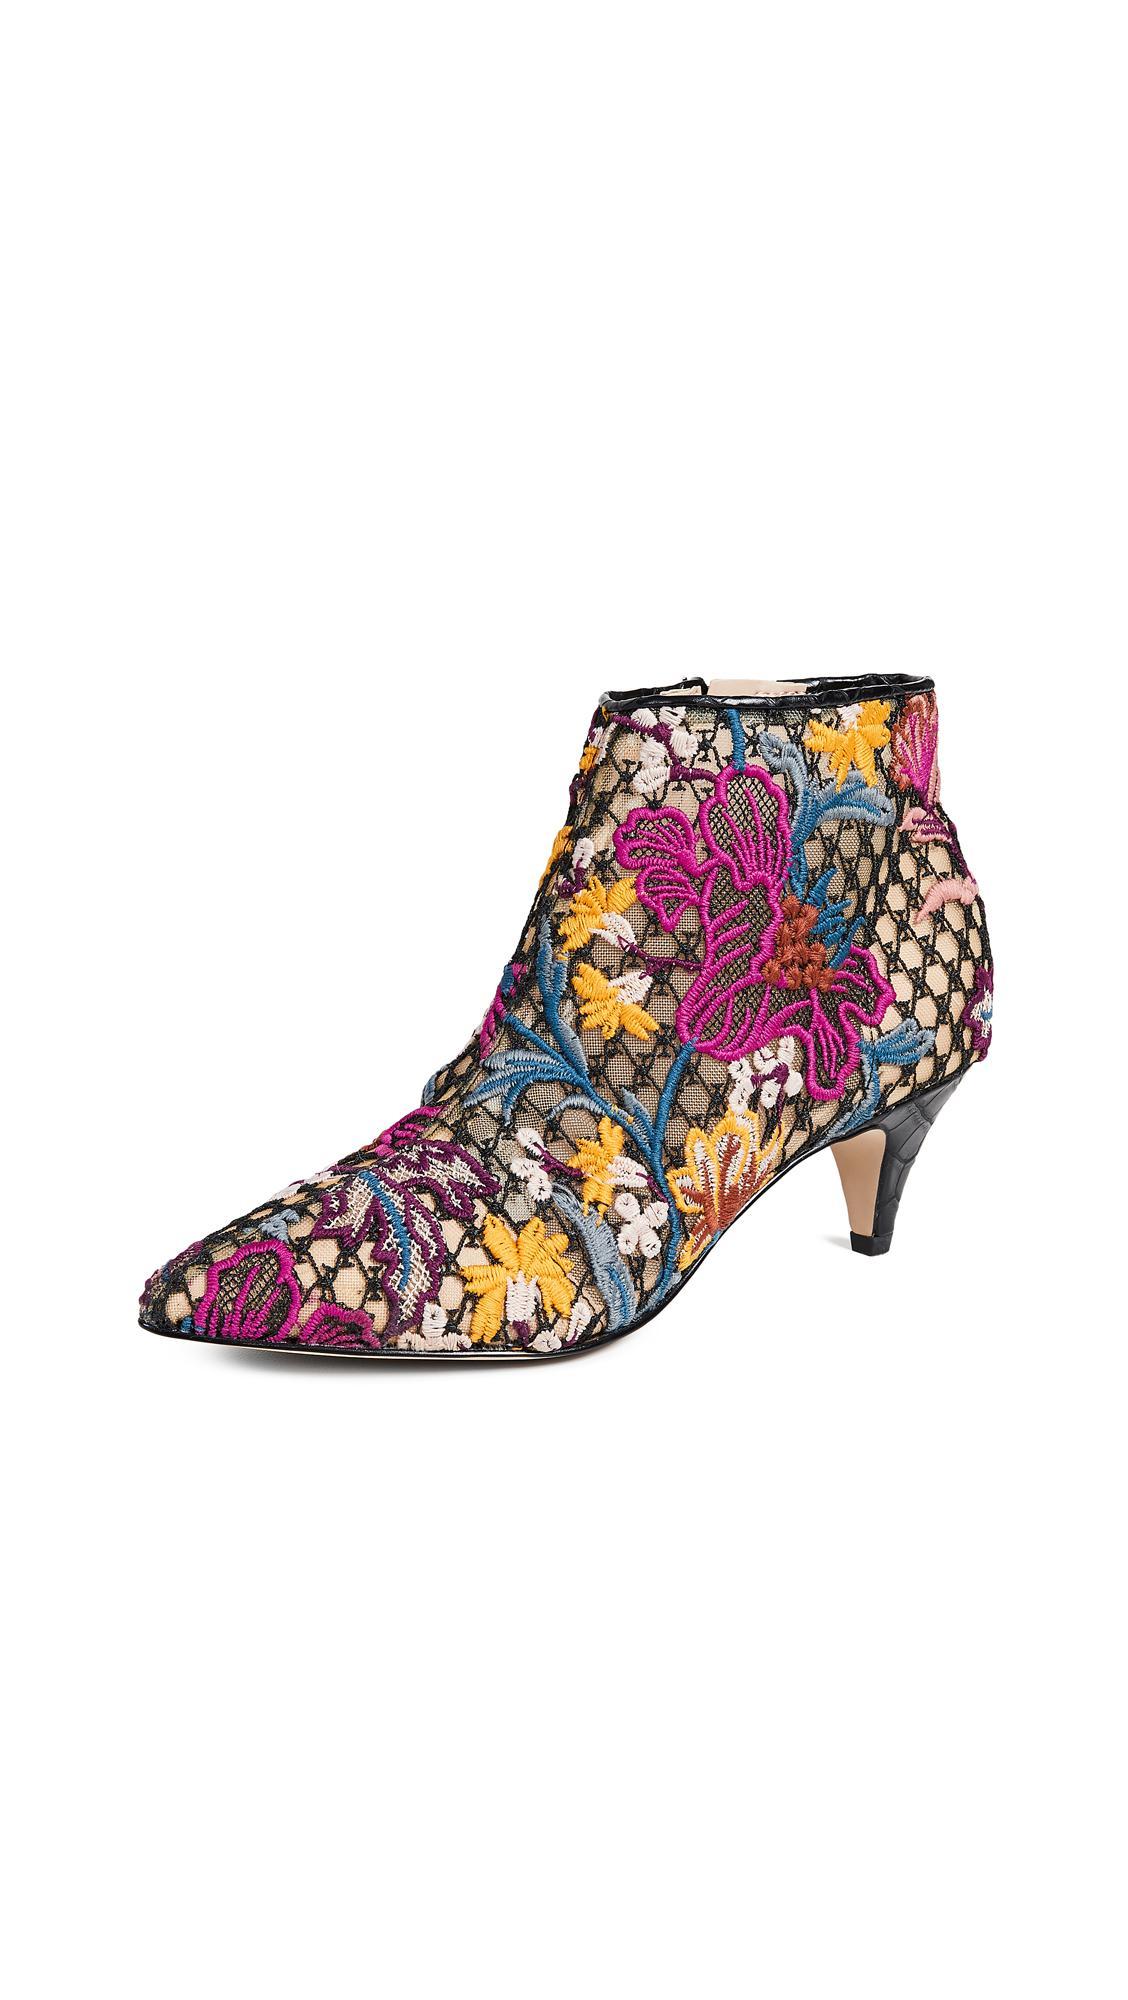 1d0687c3fff0 Sam Edelman Women s Kinzey Floral-Embroidered Kitten-Heel Booties In Bright  Multi